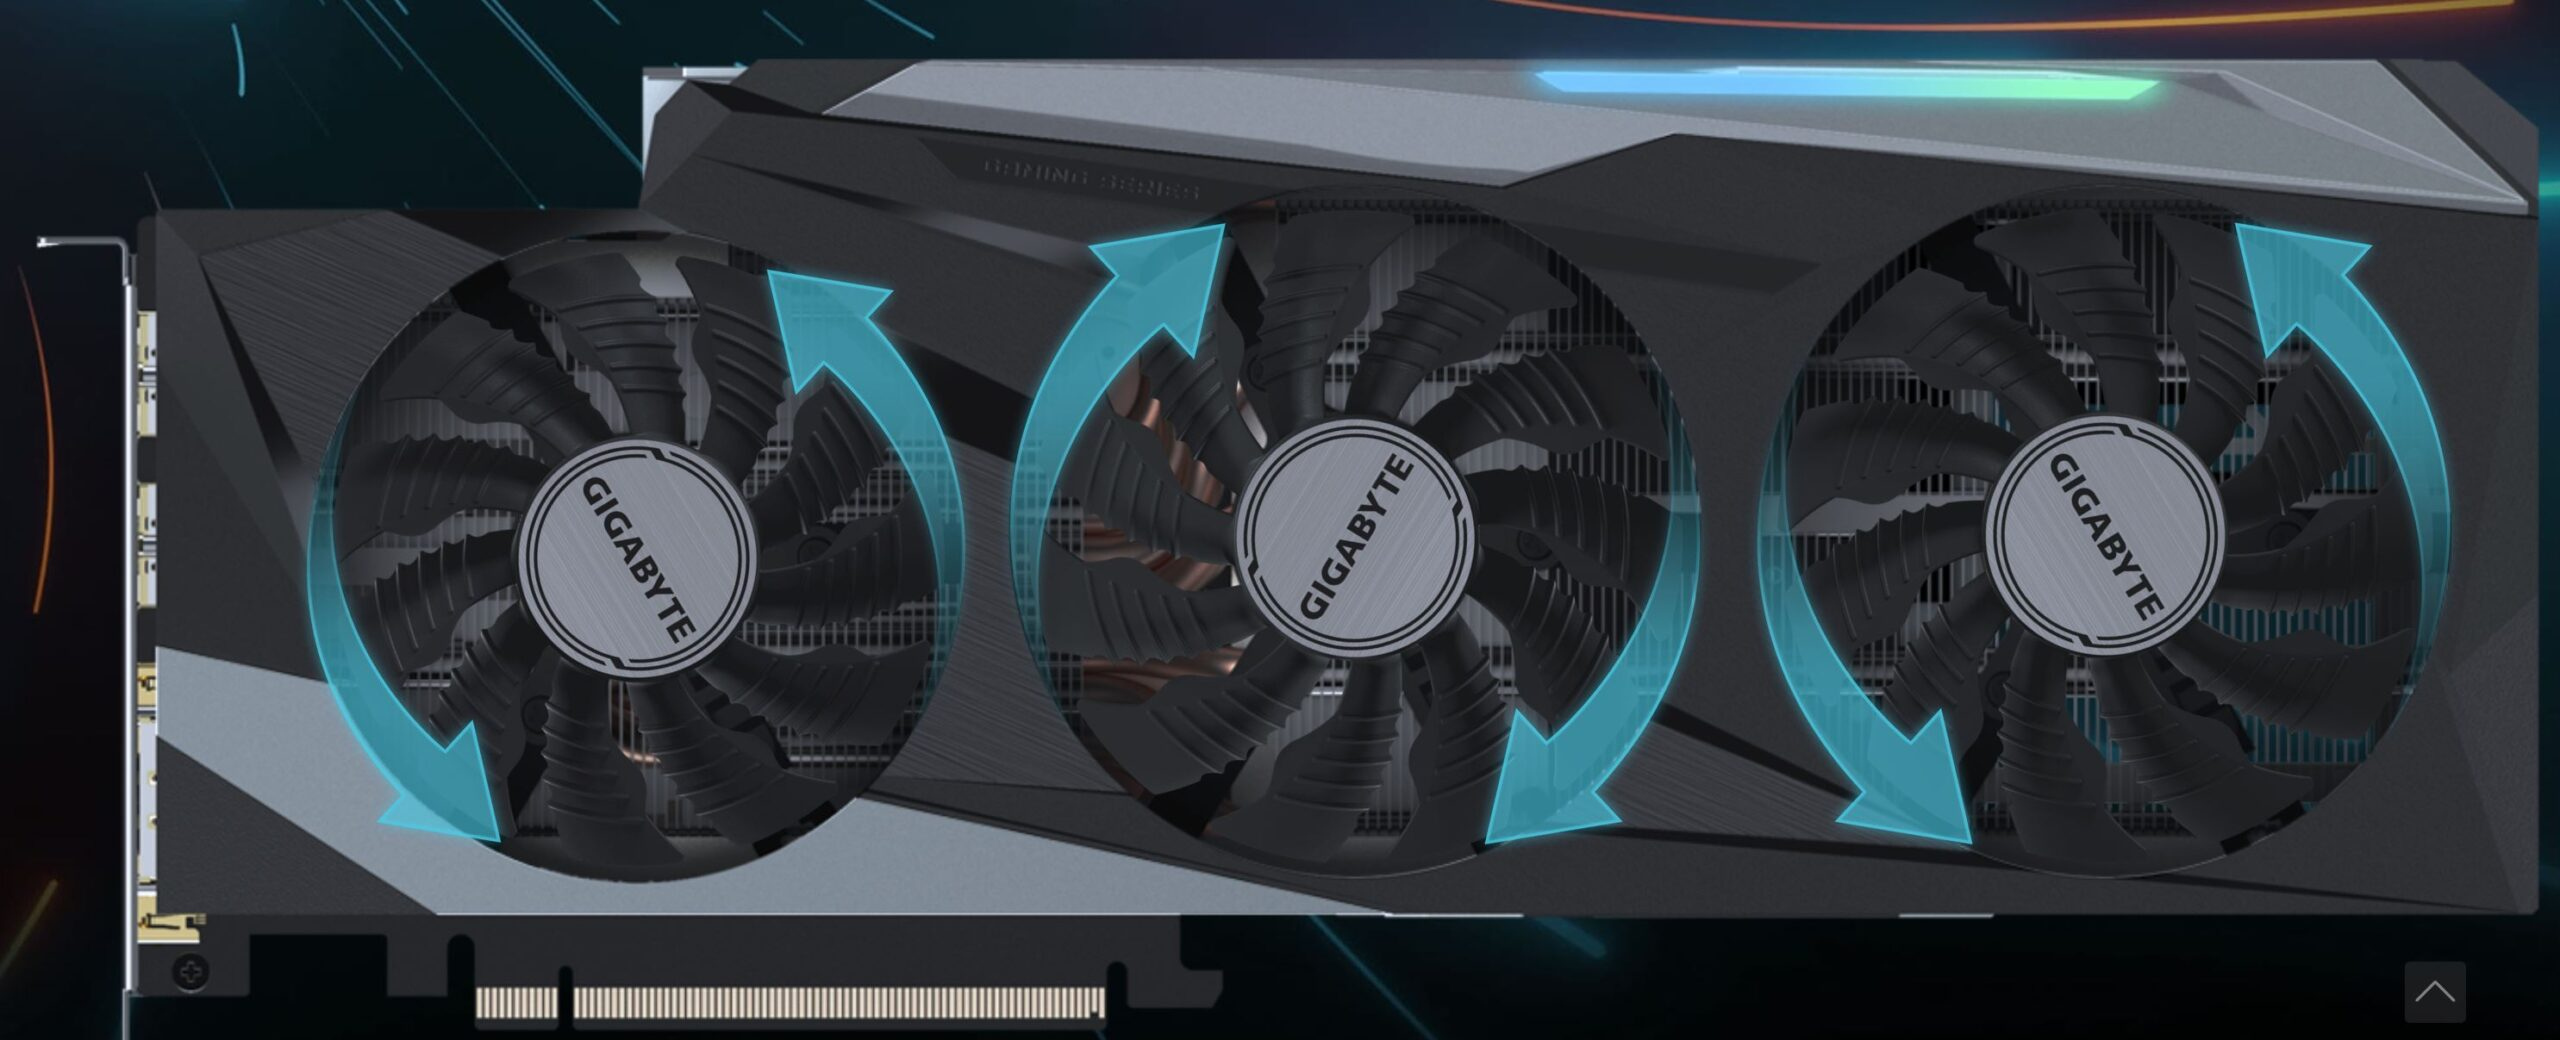 Gigabyte GeForce RTX 3090 Gaming OC scaled